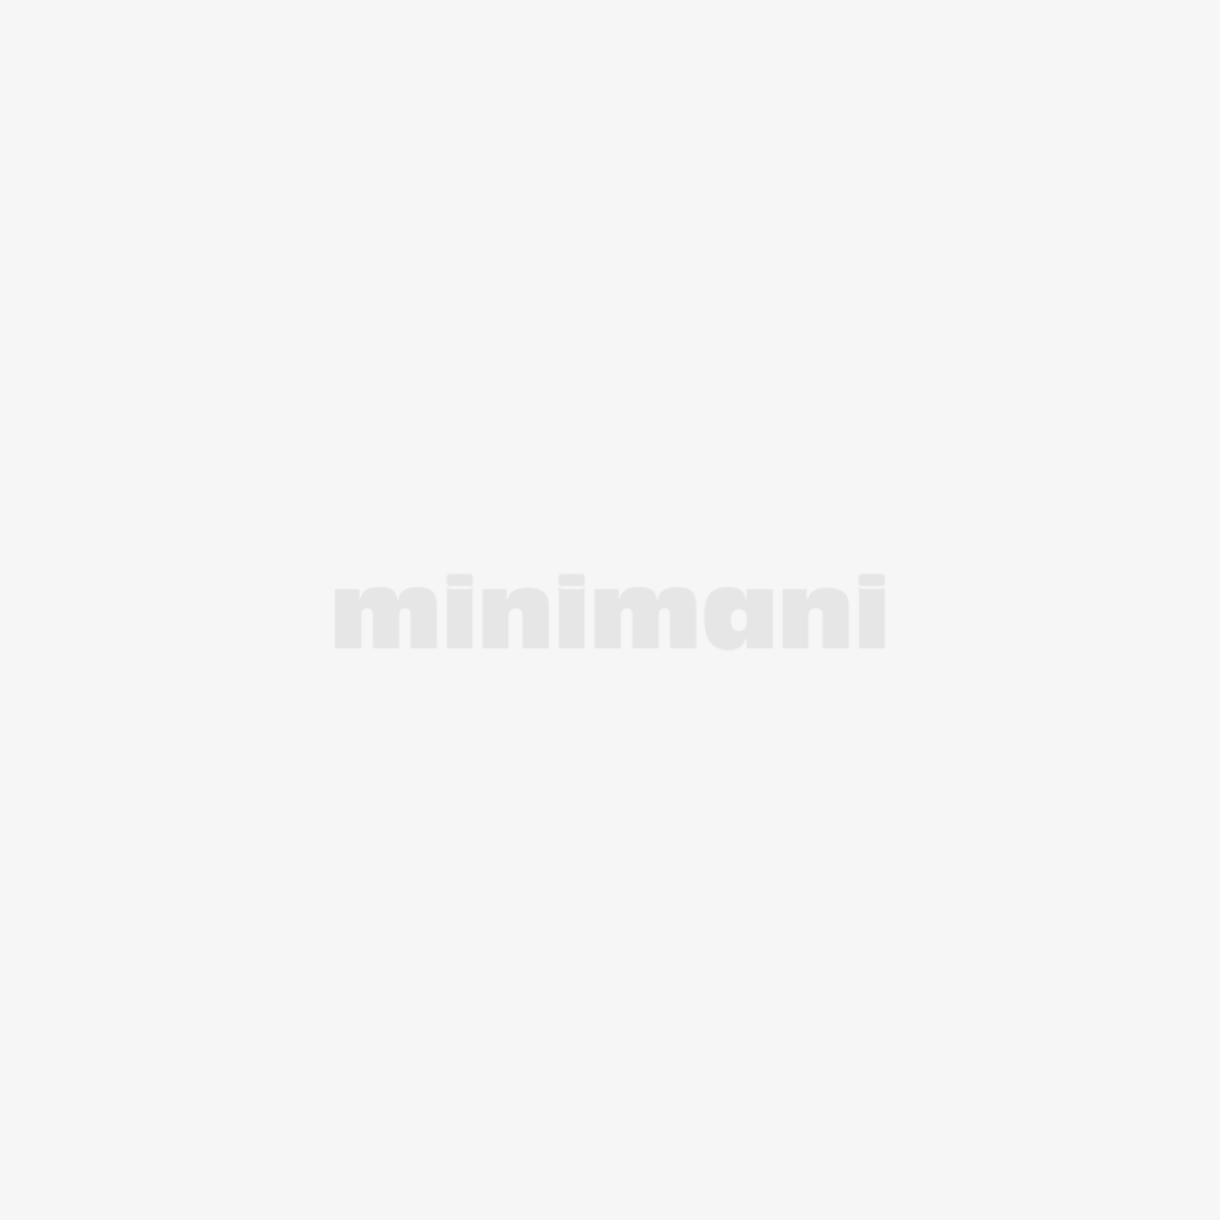 STANLEY KIILLELIIMAPUIKKO LT 1-GS250RGB LT PUN/VIHR/SIN  11.3mm